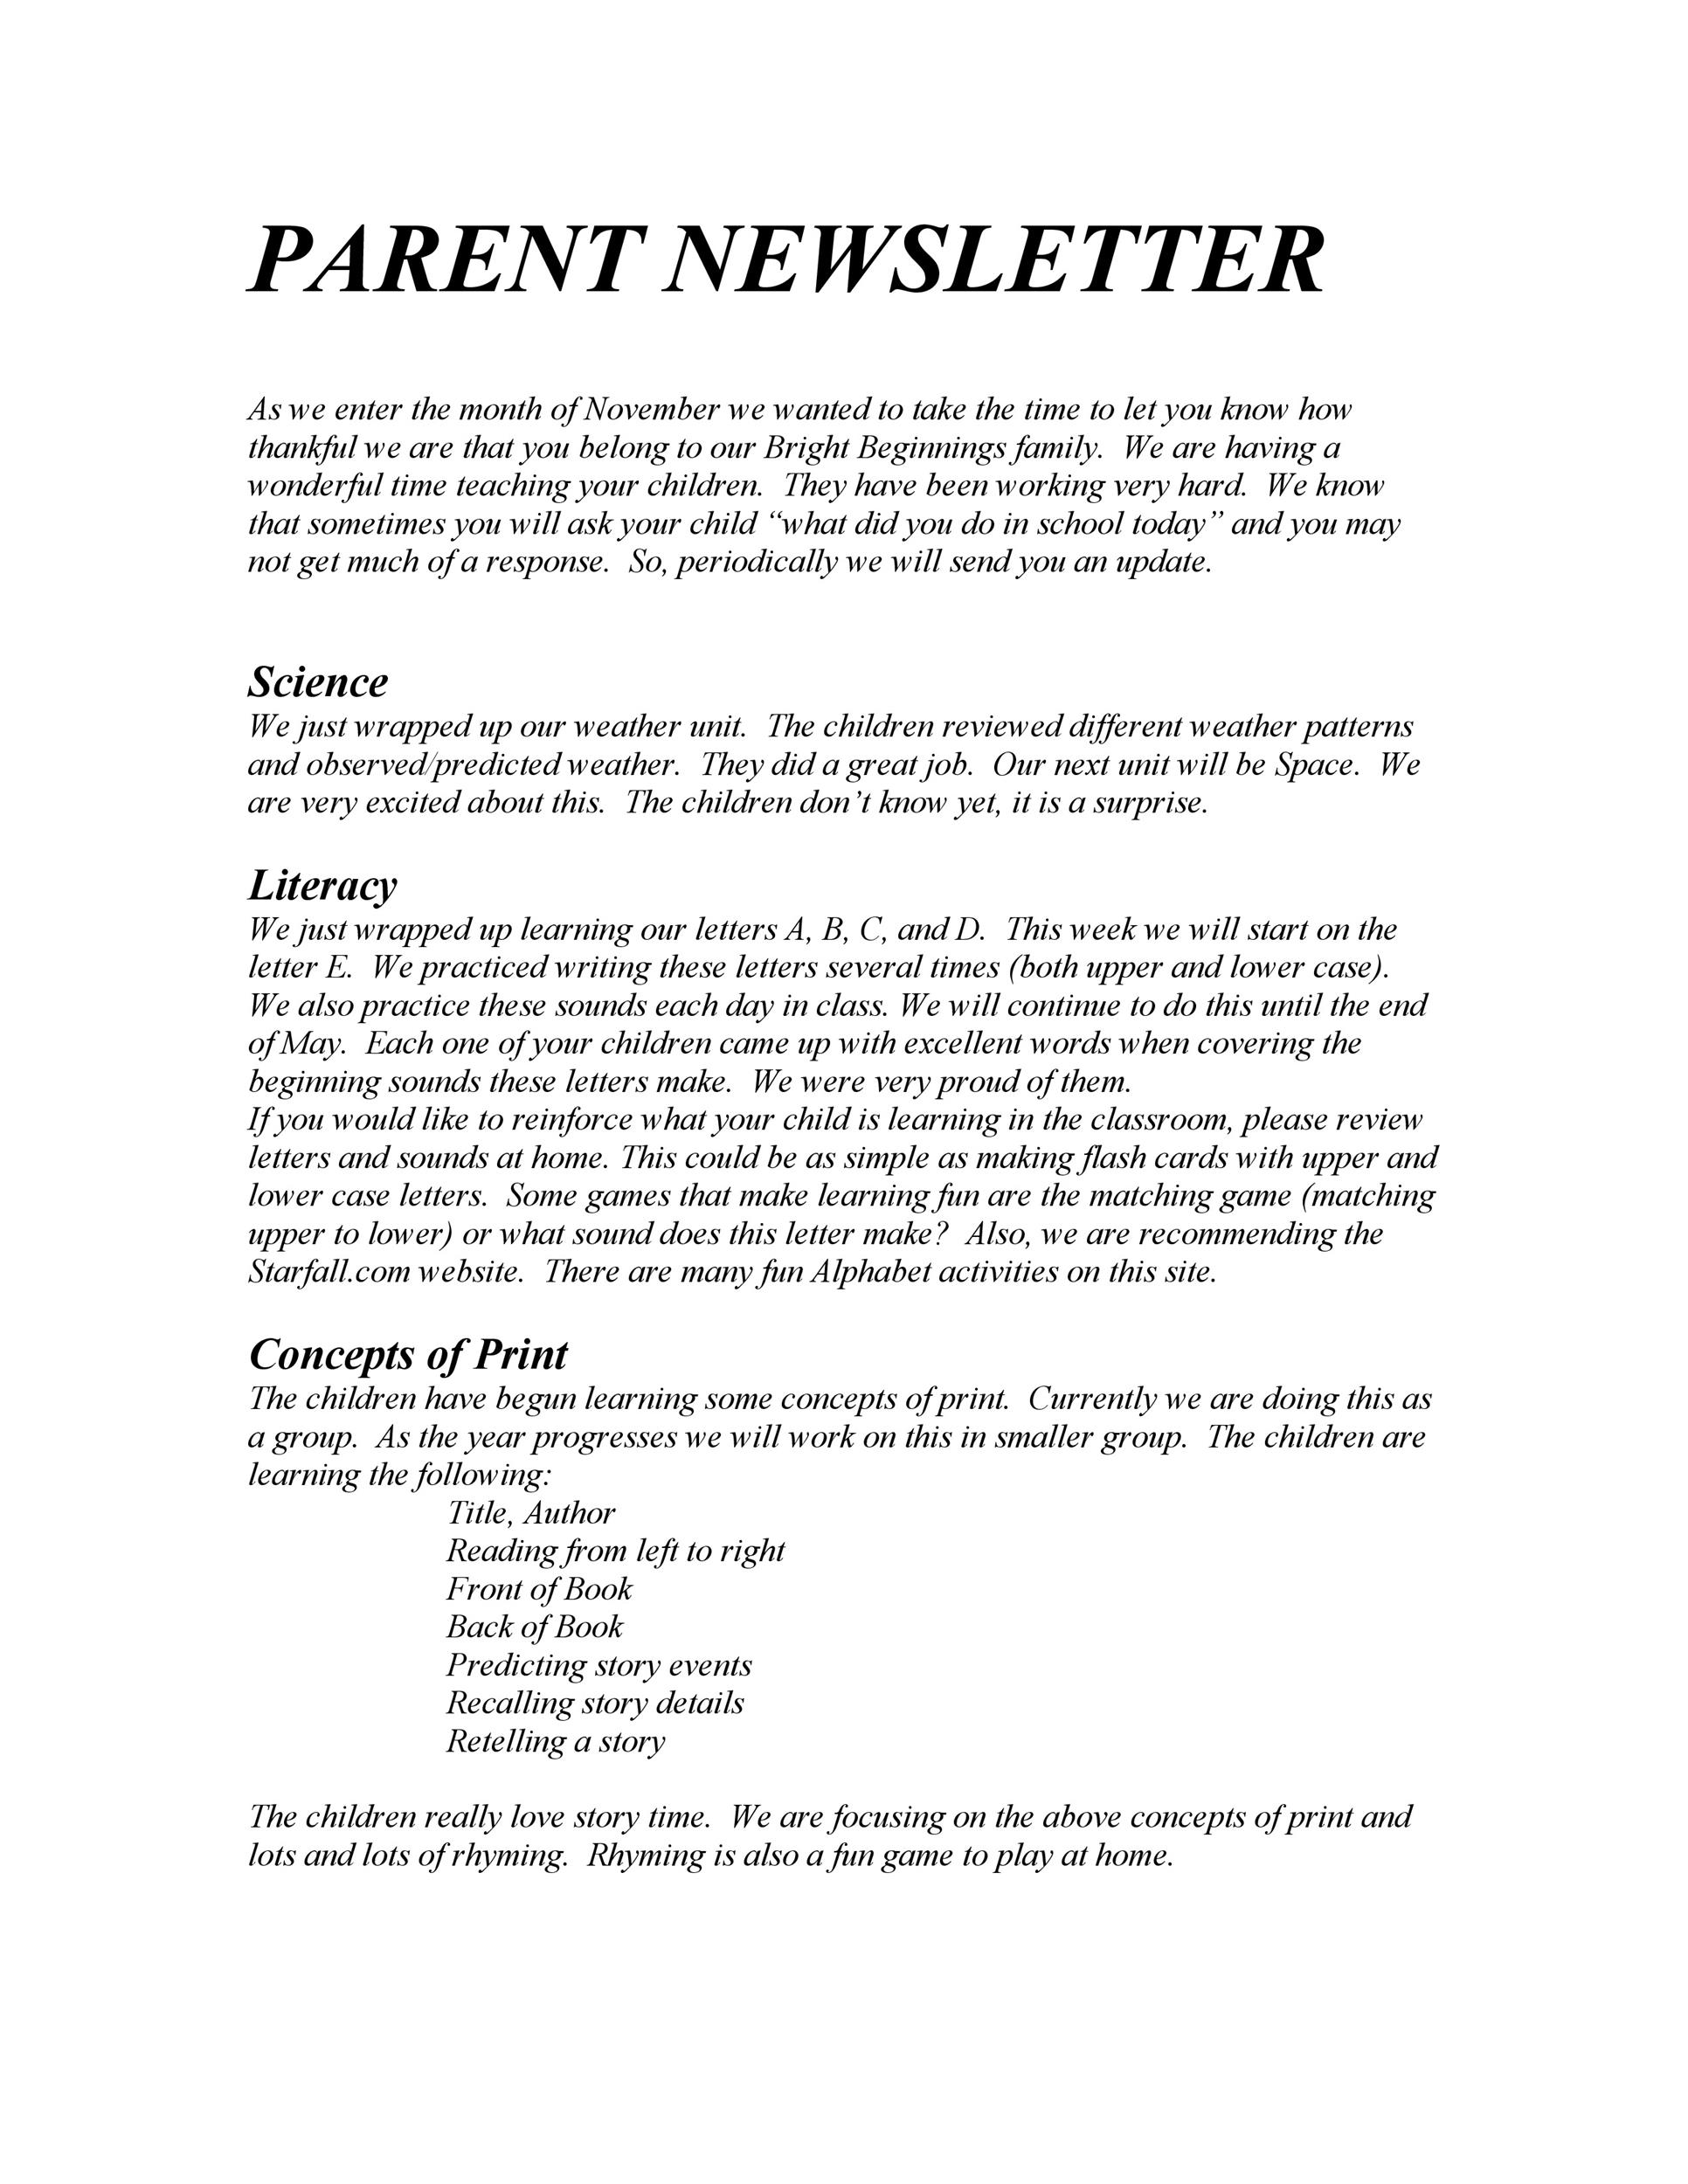 50 Creative Preschool Newsletter Templates (+Tips) ᐅ Template Lab